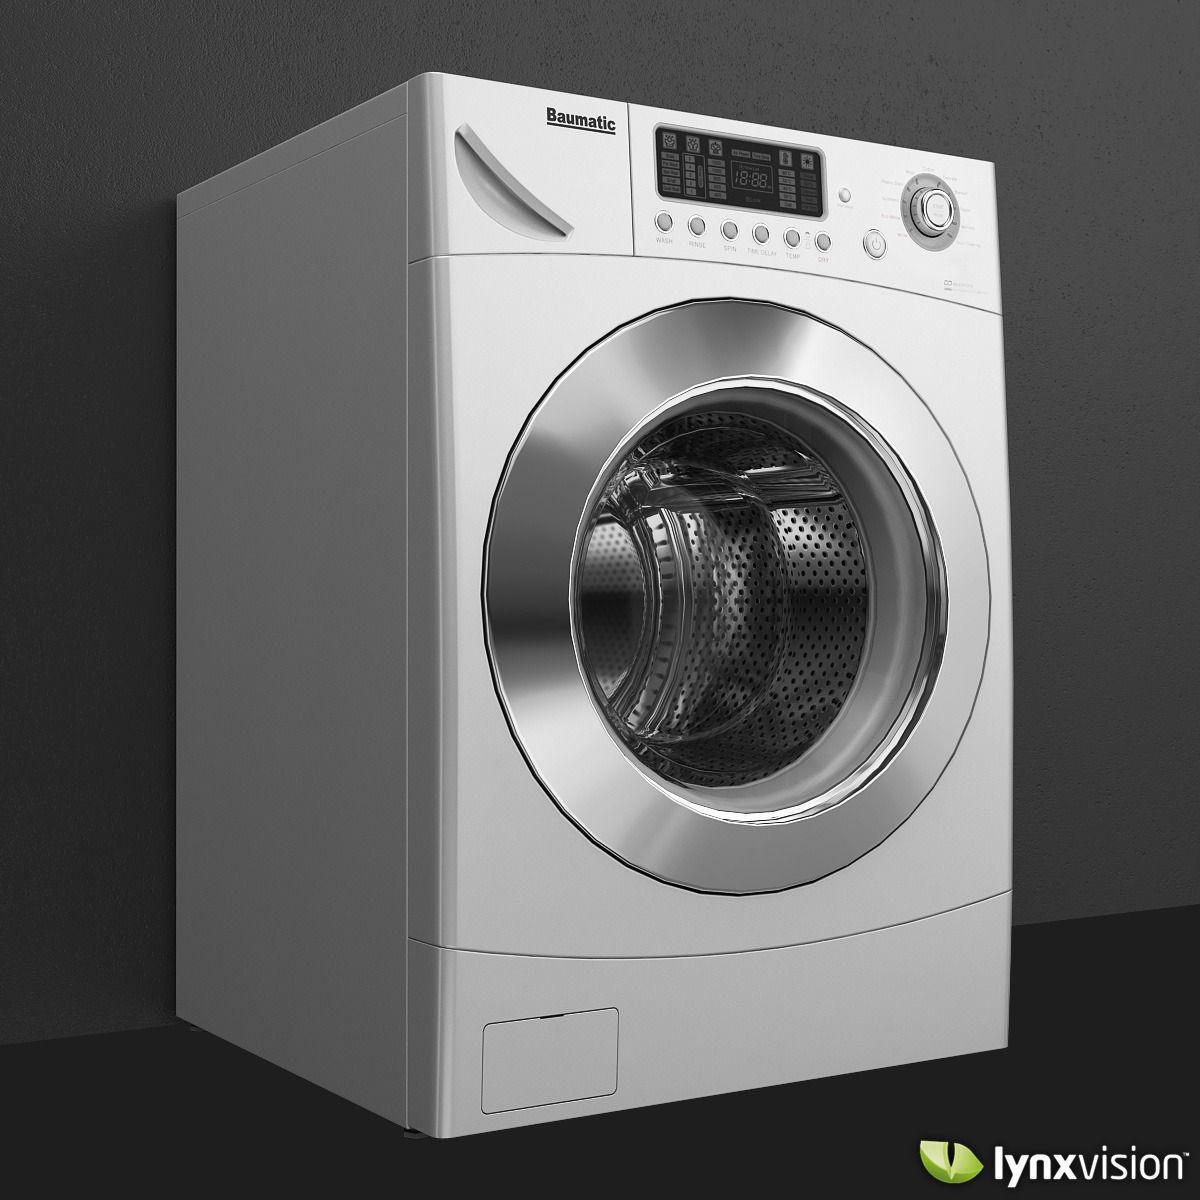 Baumatic Mega10wd Washer And Dryer 3d Model Max Obj